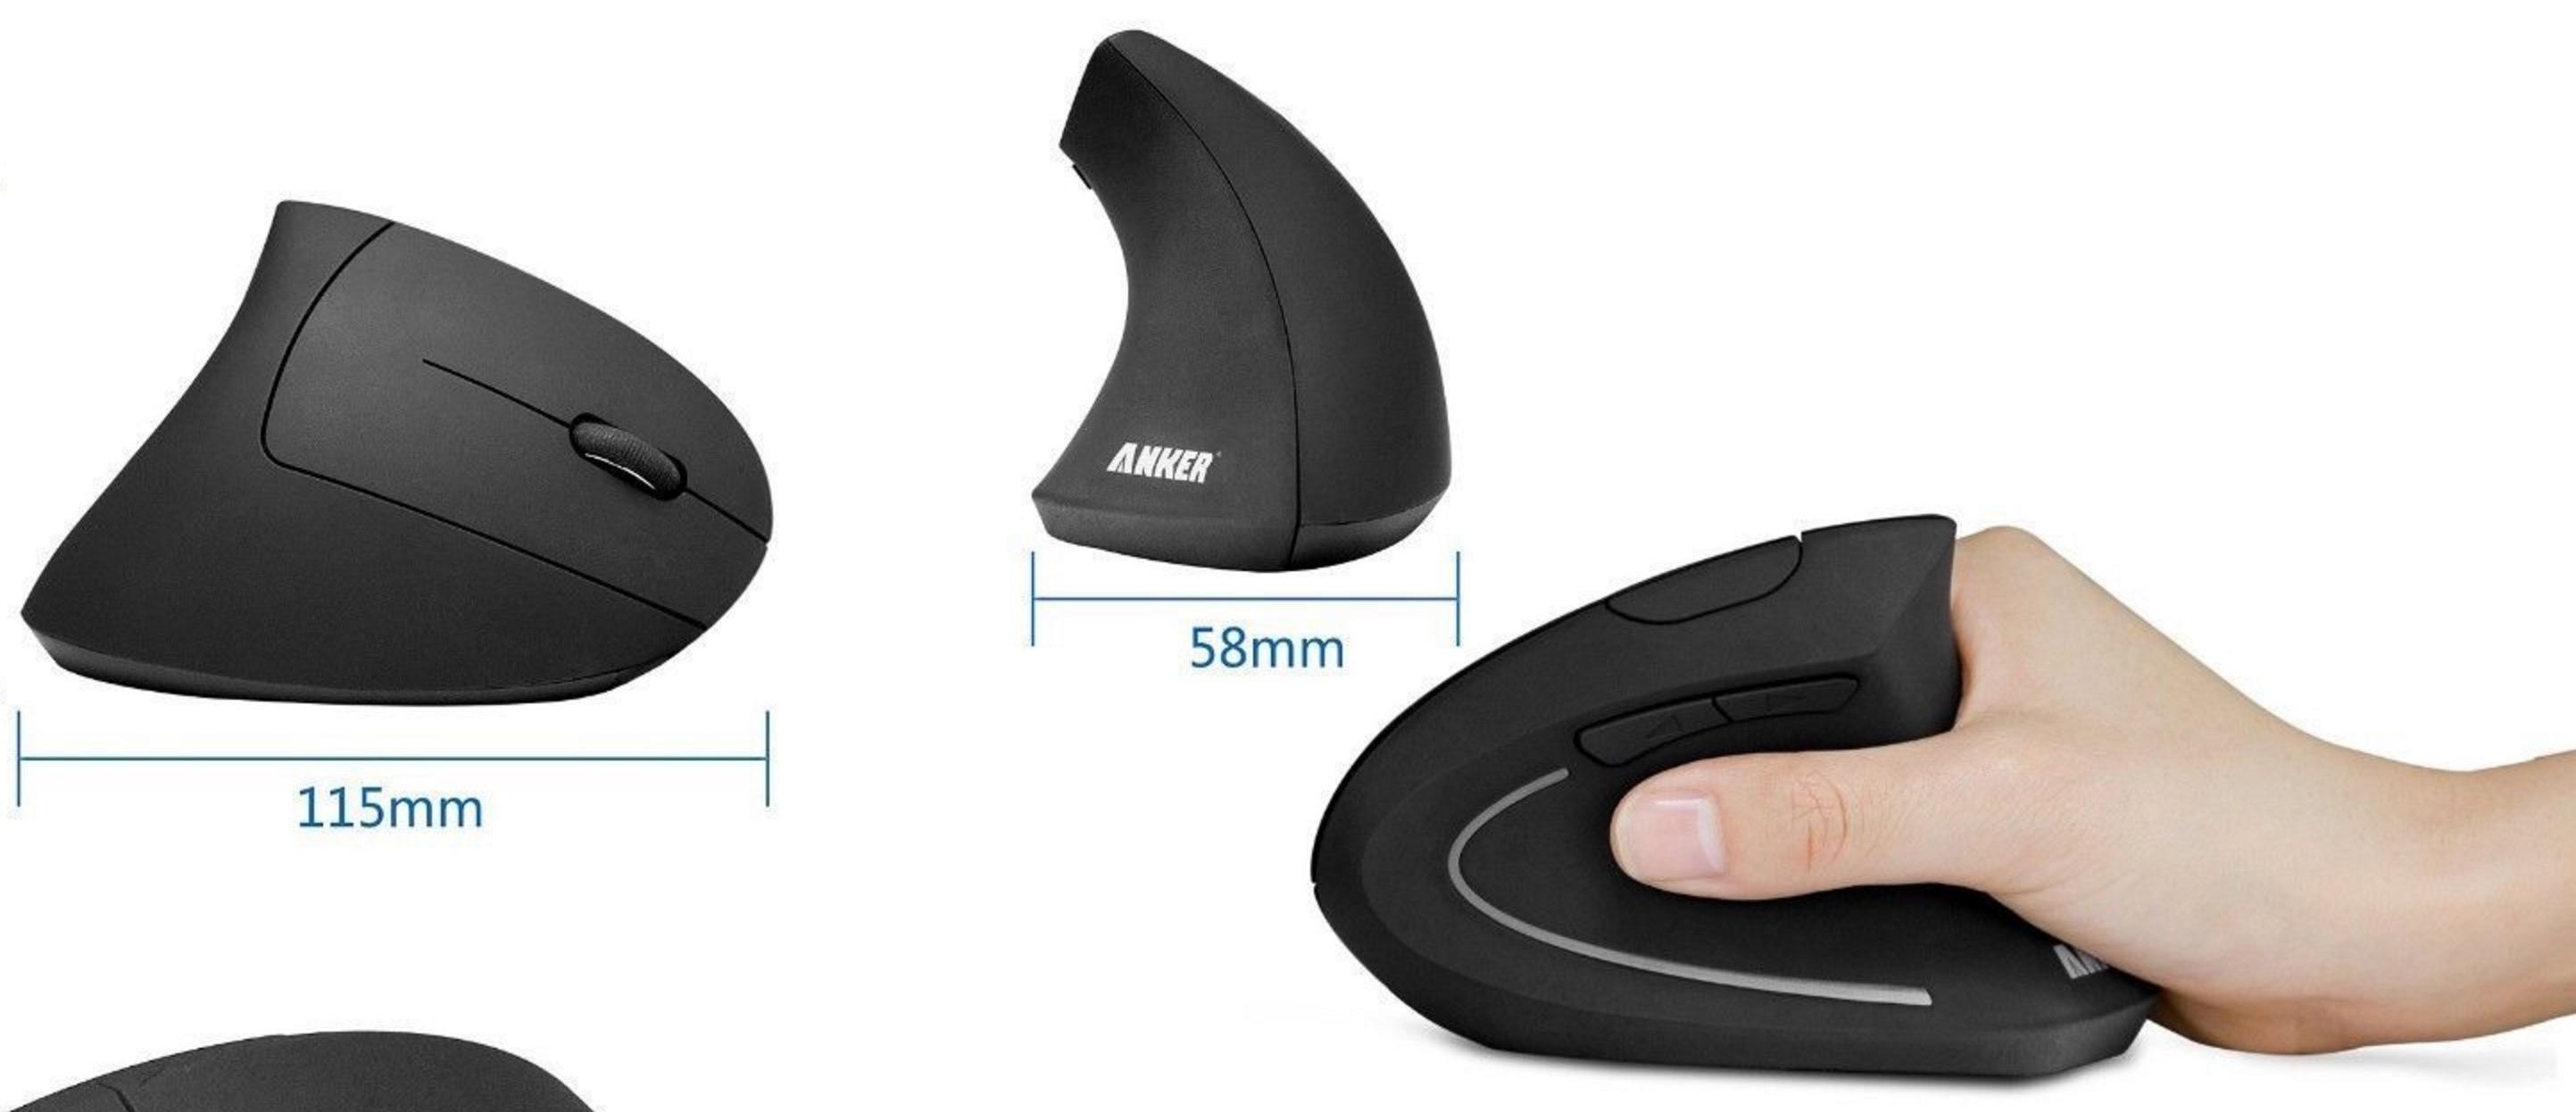 bba85cc7b35 Pin by Soumitro Datta on ergonomic grips | Ergonomic mouse, Computer mouse,  Gadgets